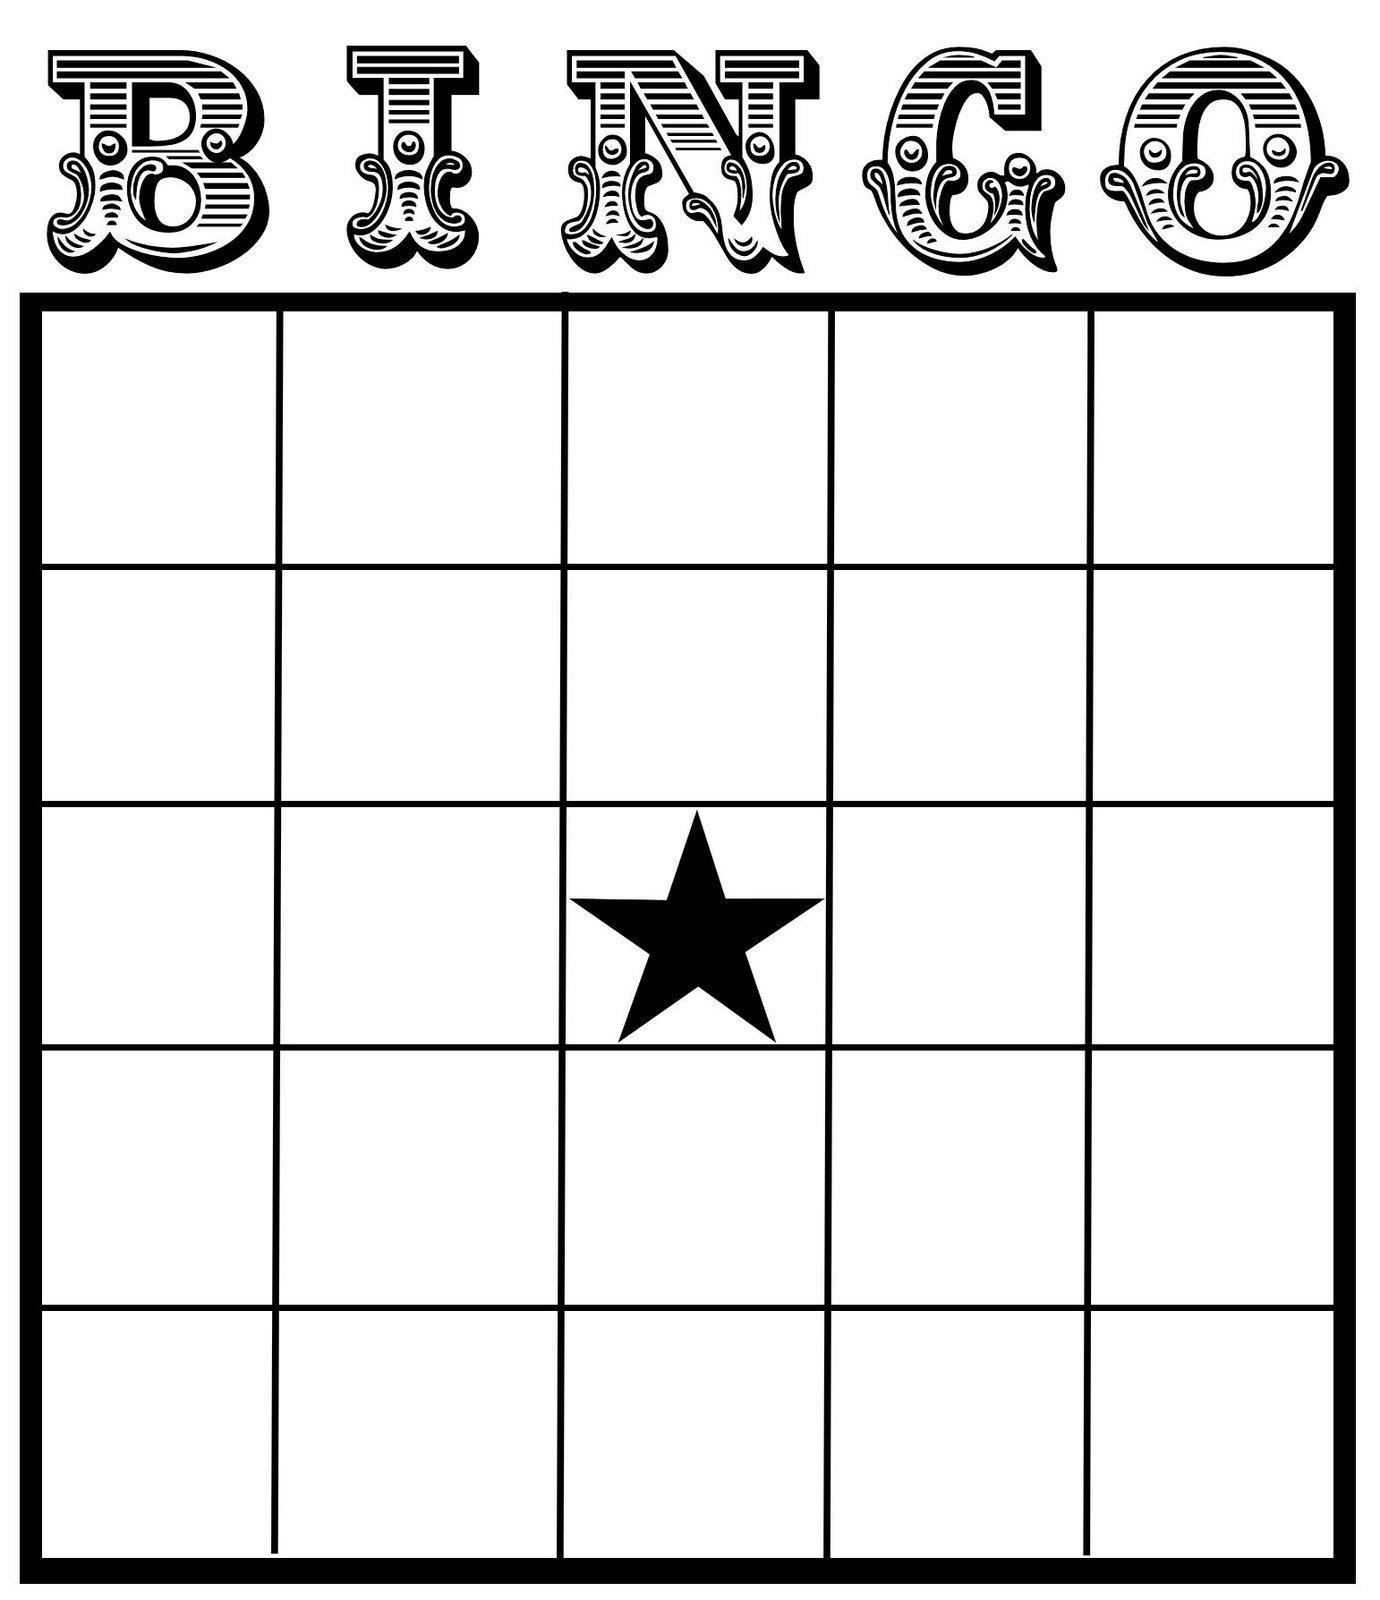 Free Bingo Card Template Christine Zani Bingo Card Printables to